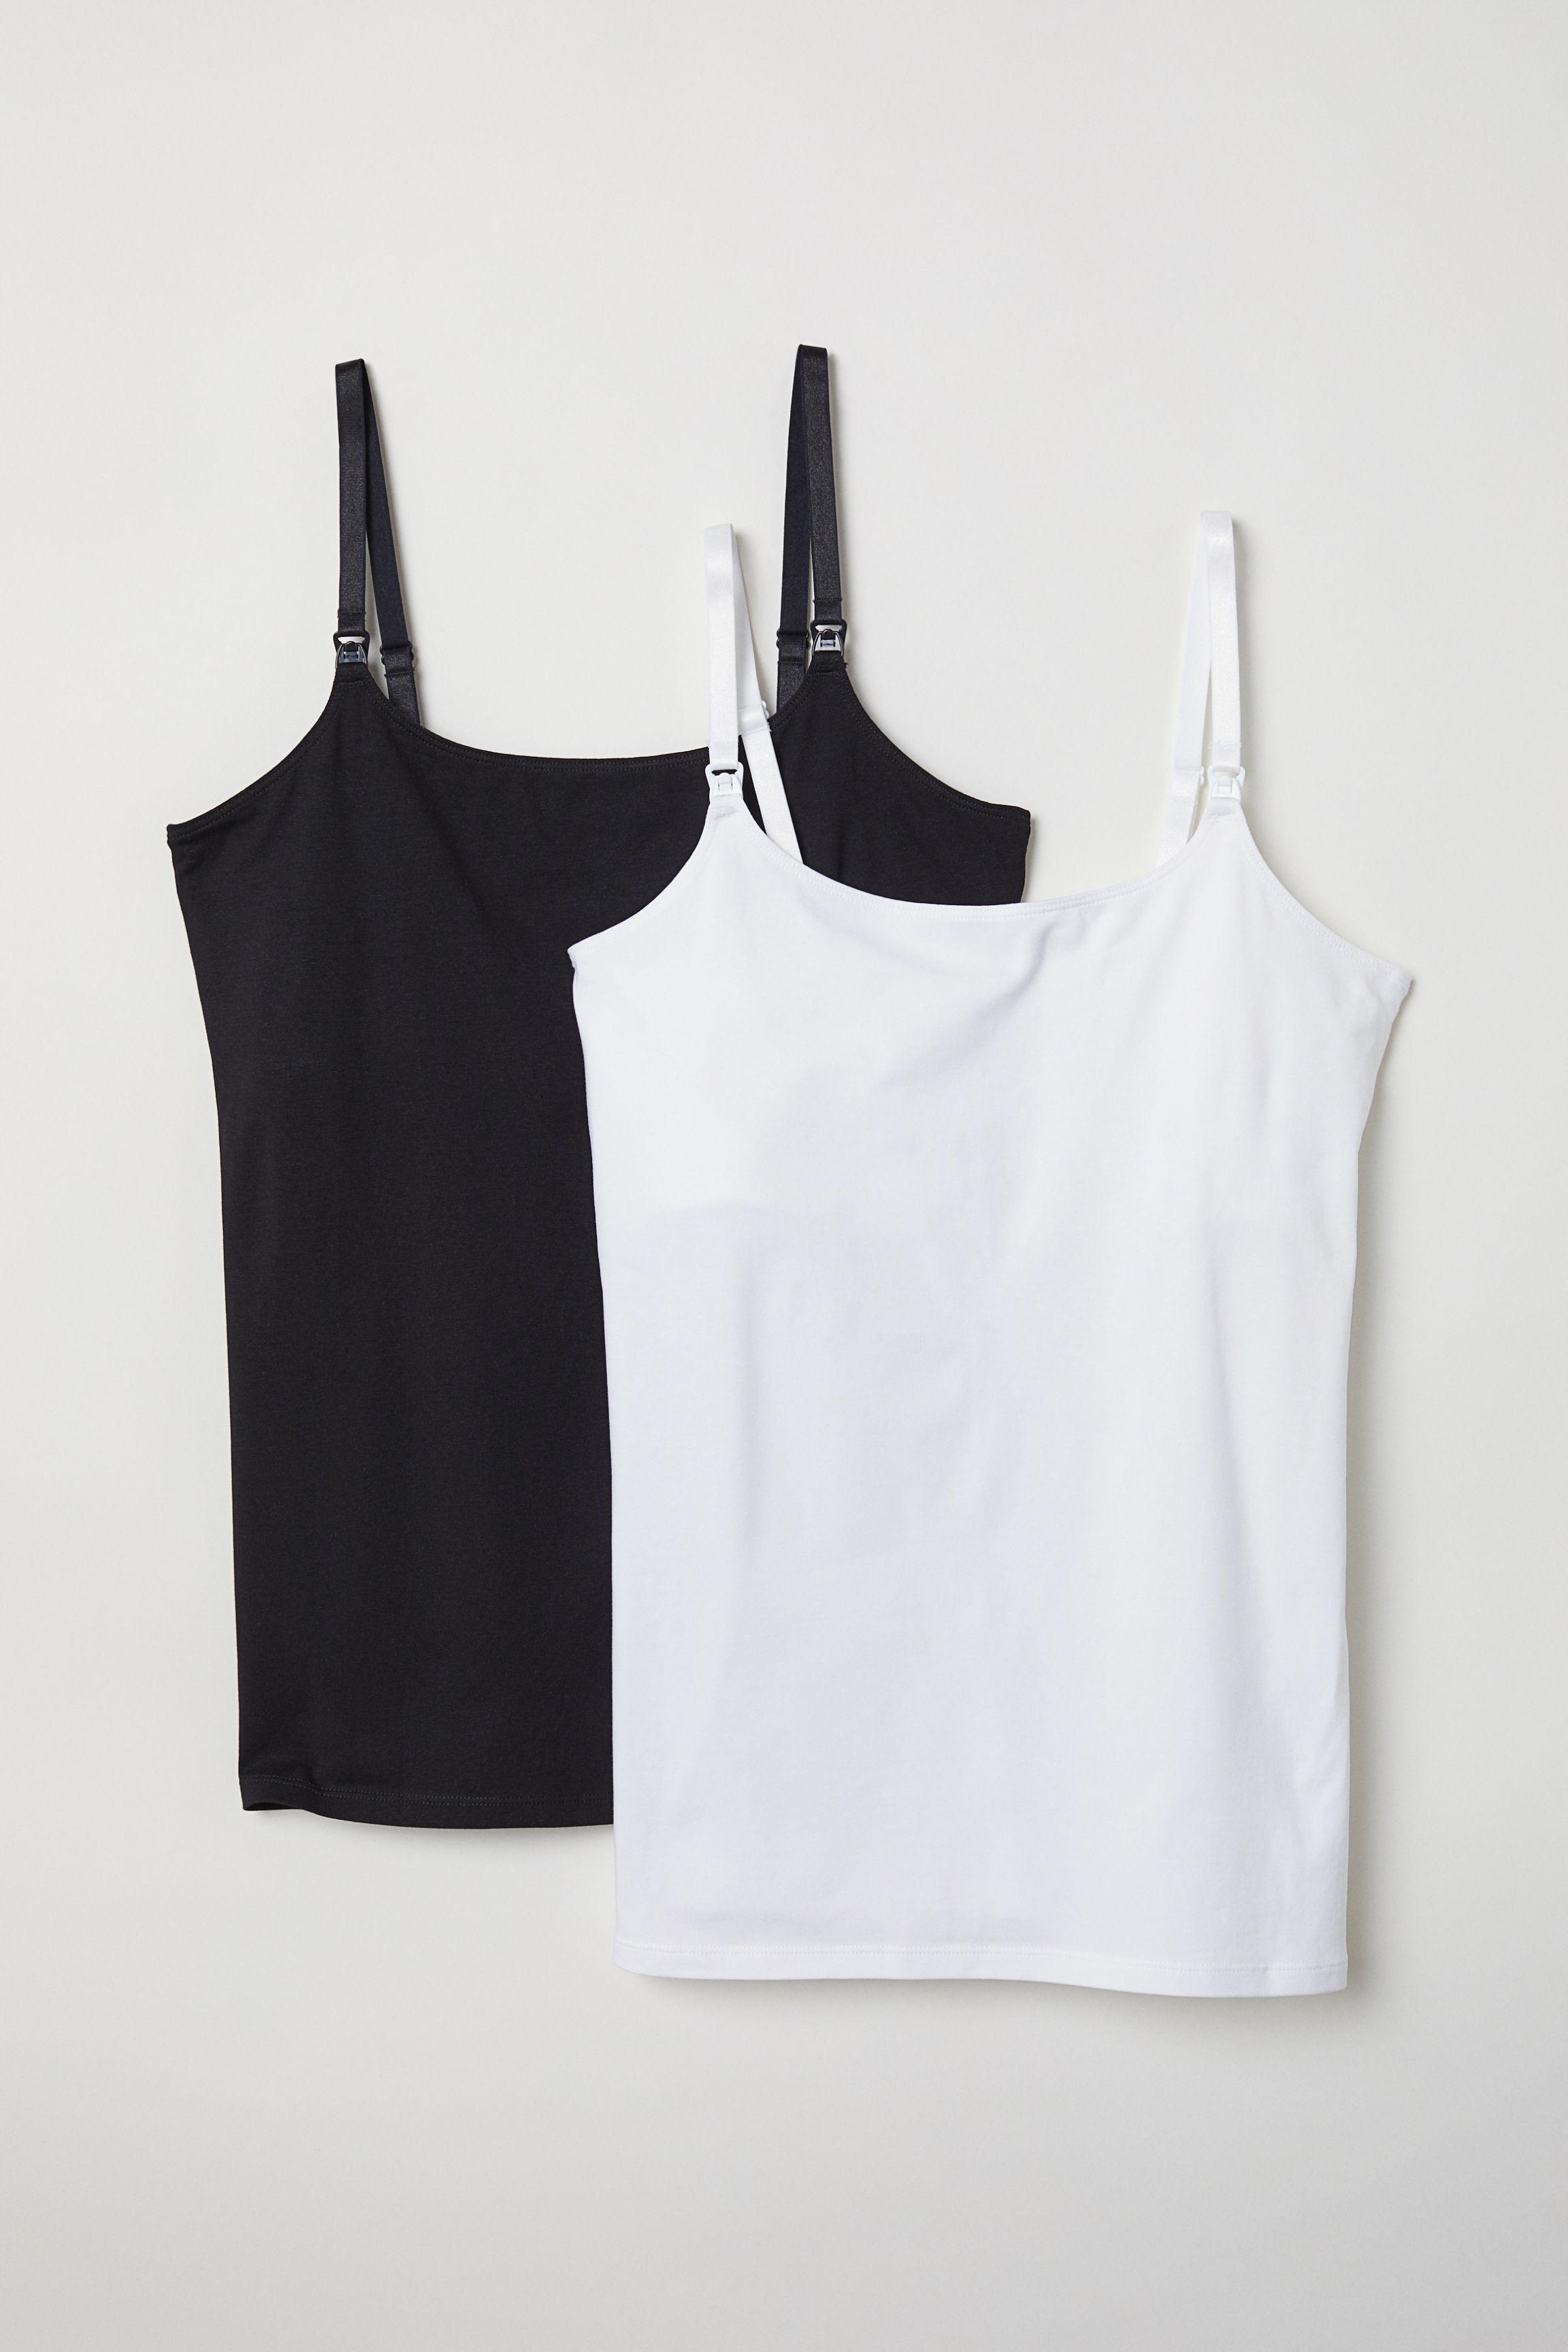 d57a0e72d1d7c7 MAMA 2-pack Nursing Tank Tops - White black - Ladies